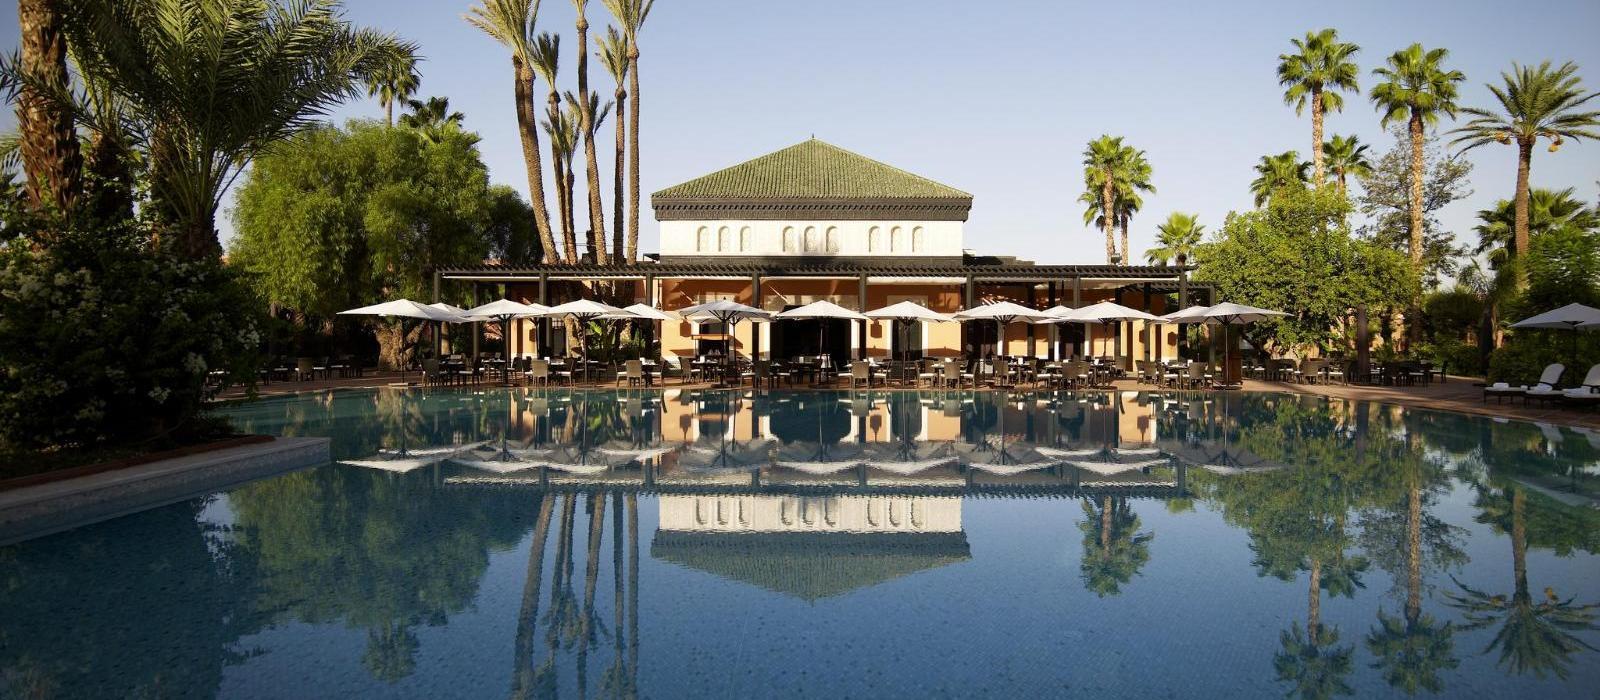 拉玛穆尼亚酒店(La Mamounia) 图片  www.lhw.cn